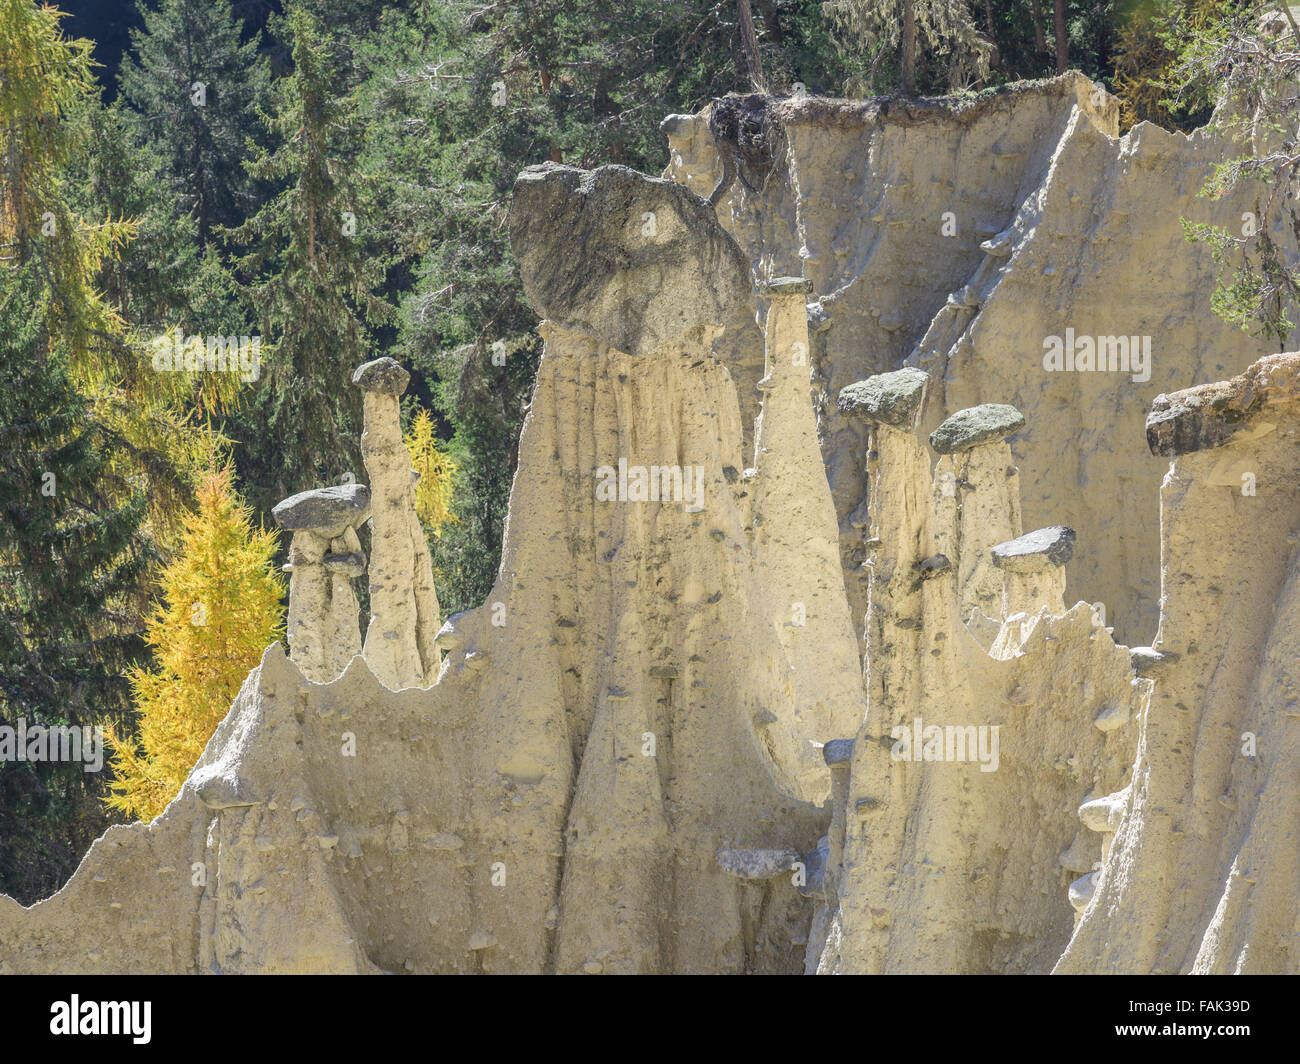 Pirámides de tierra de gutapercha, Tirol del sur, Italia Foto de stock